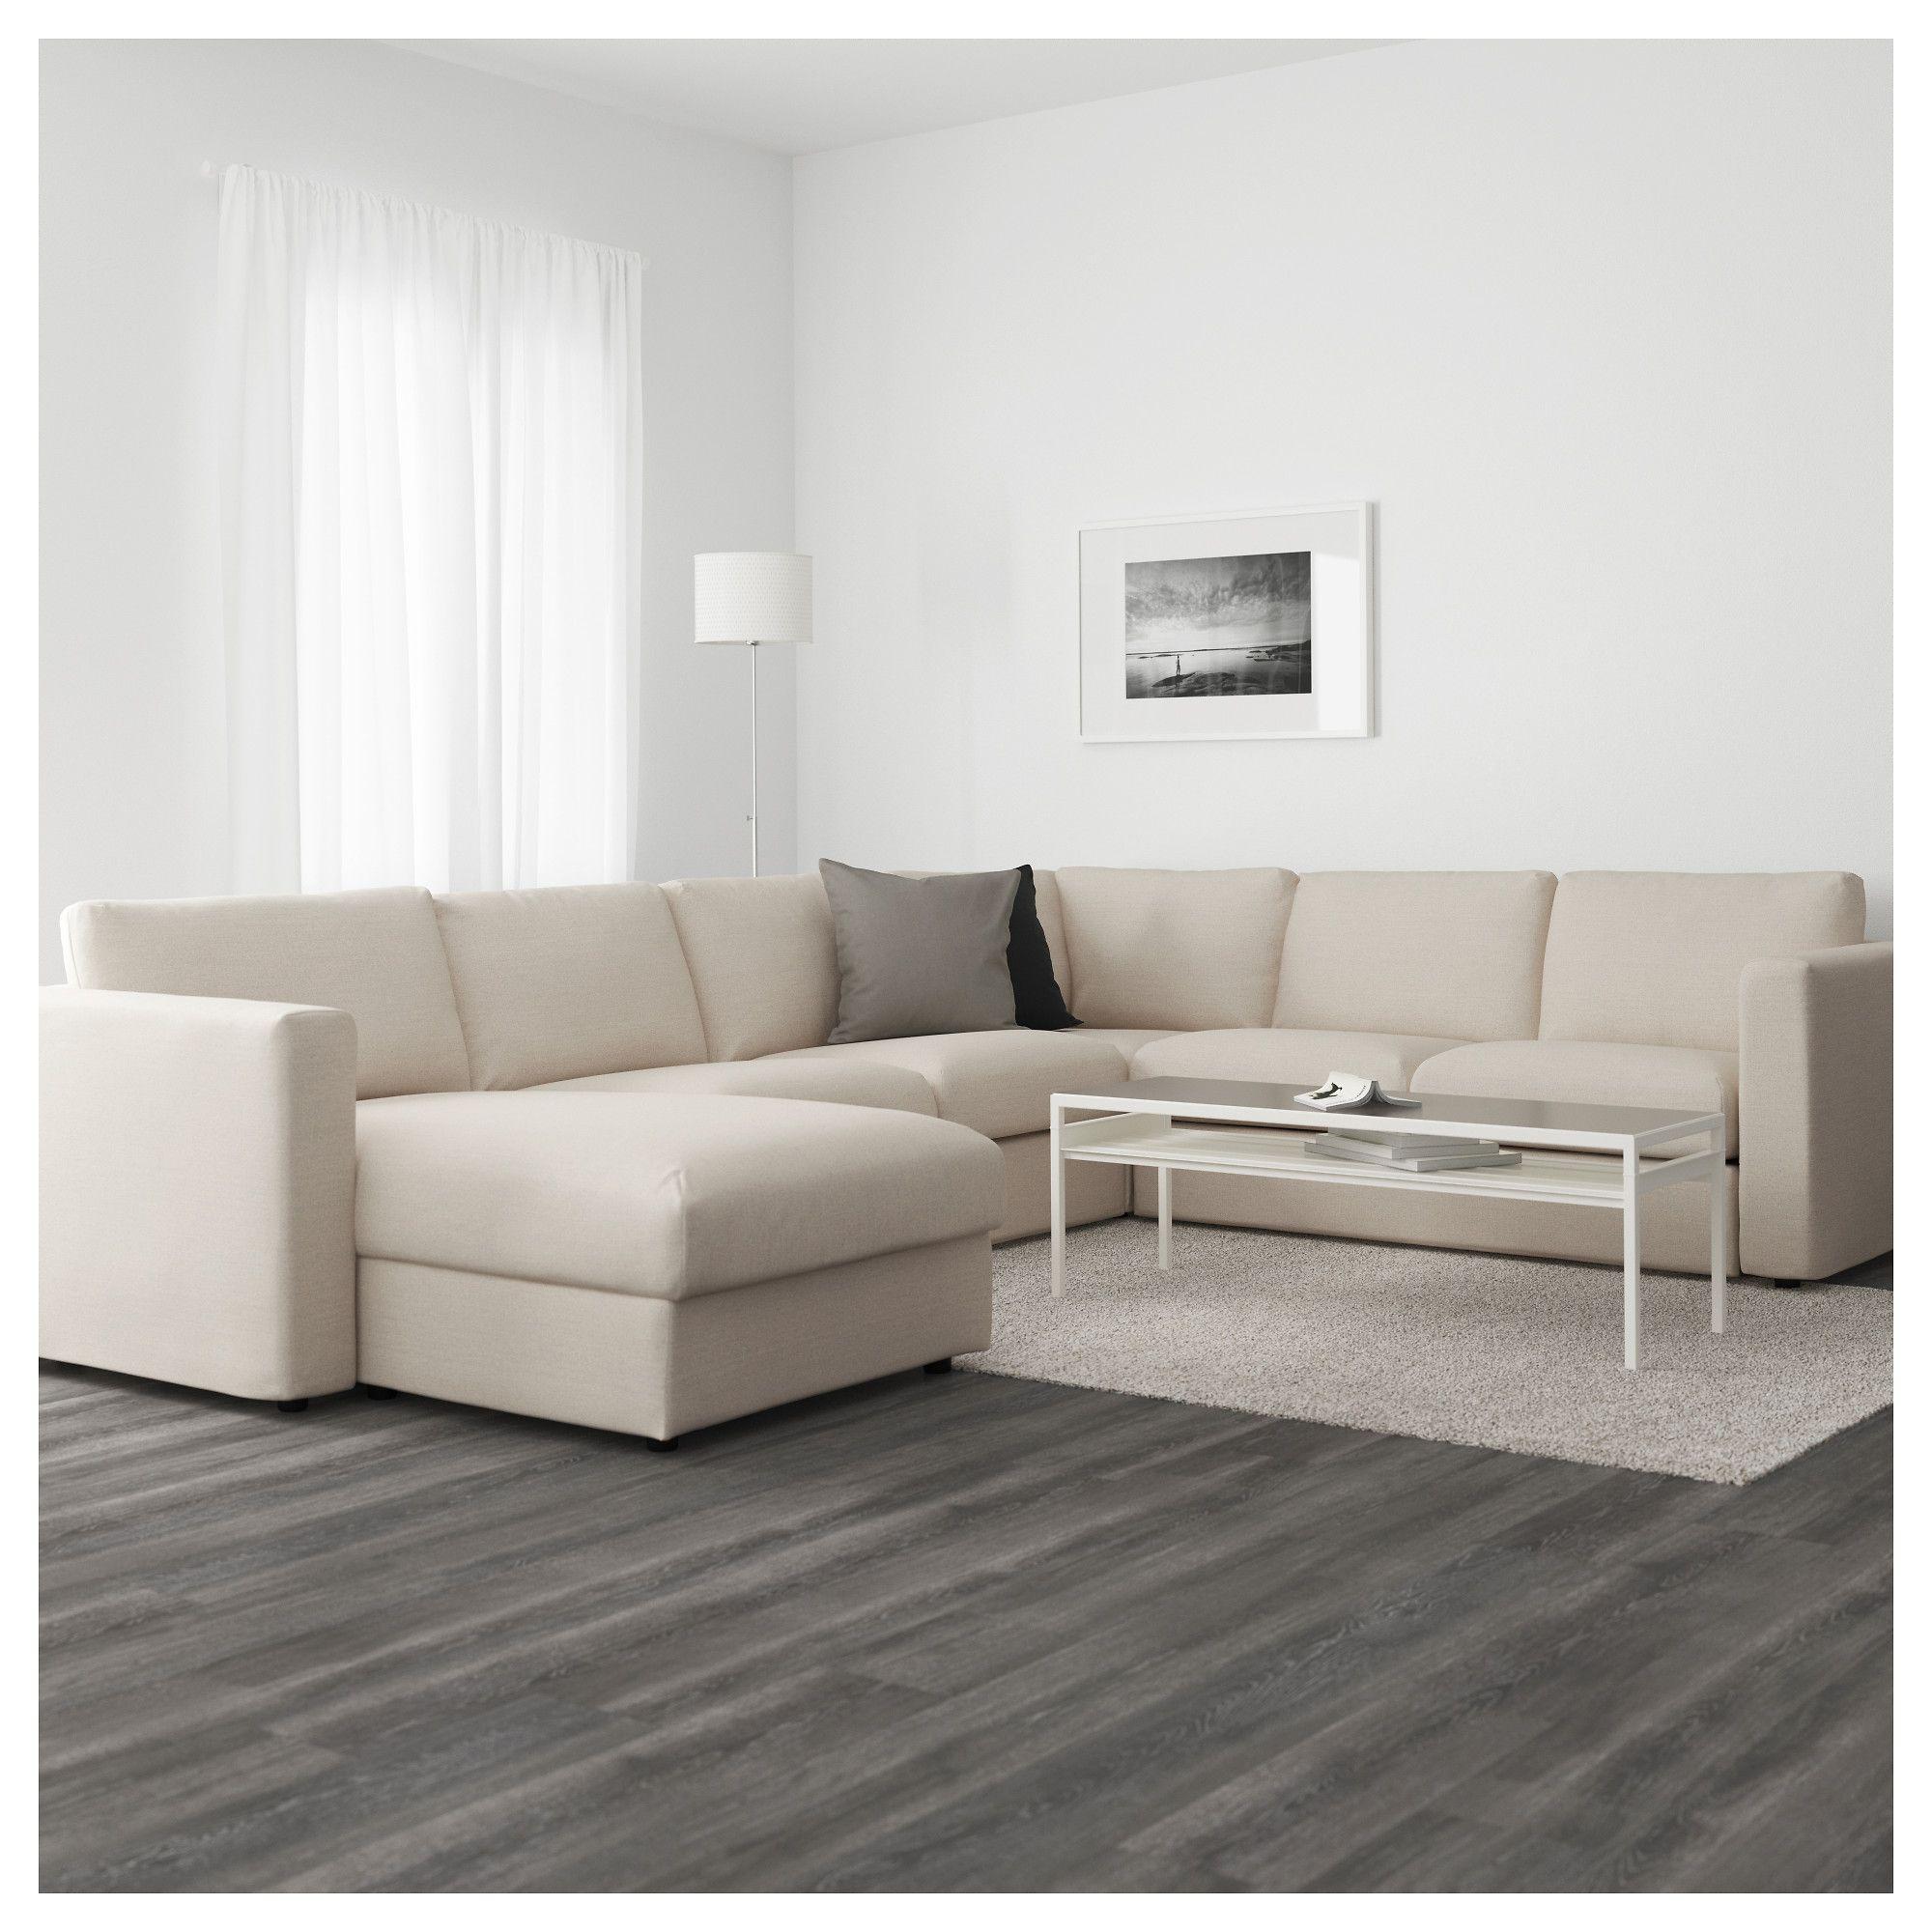 Furniture And Home Furnishings Ikea Corner Sofa Sofa Ikea Sofa